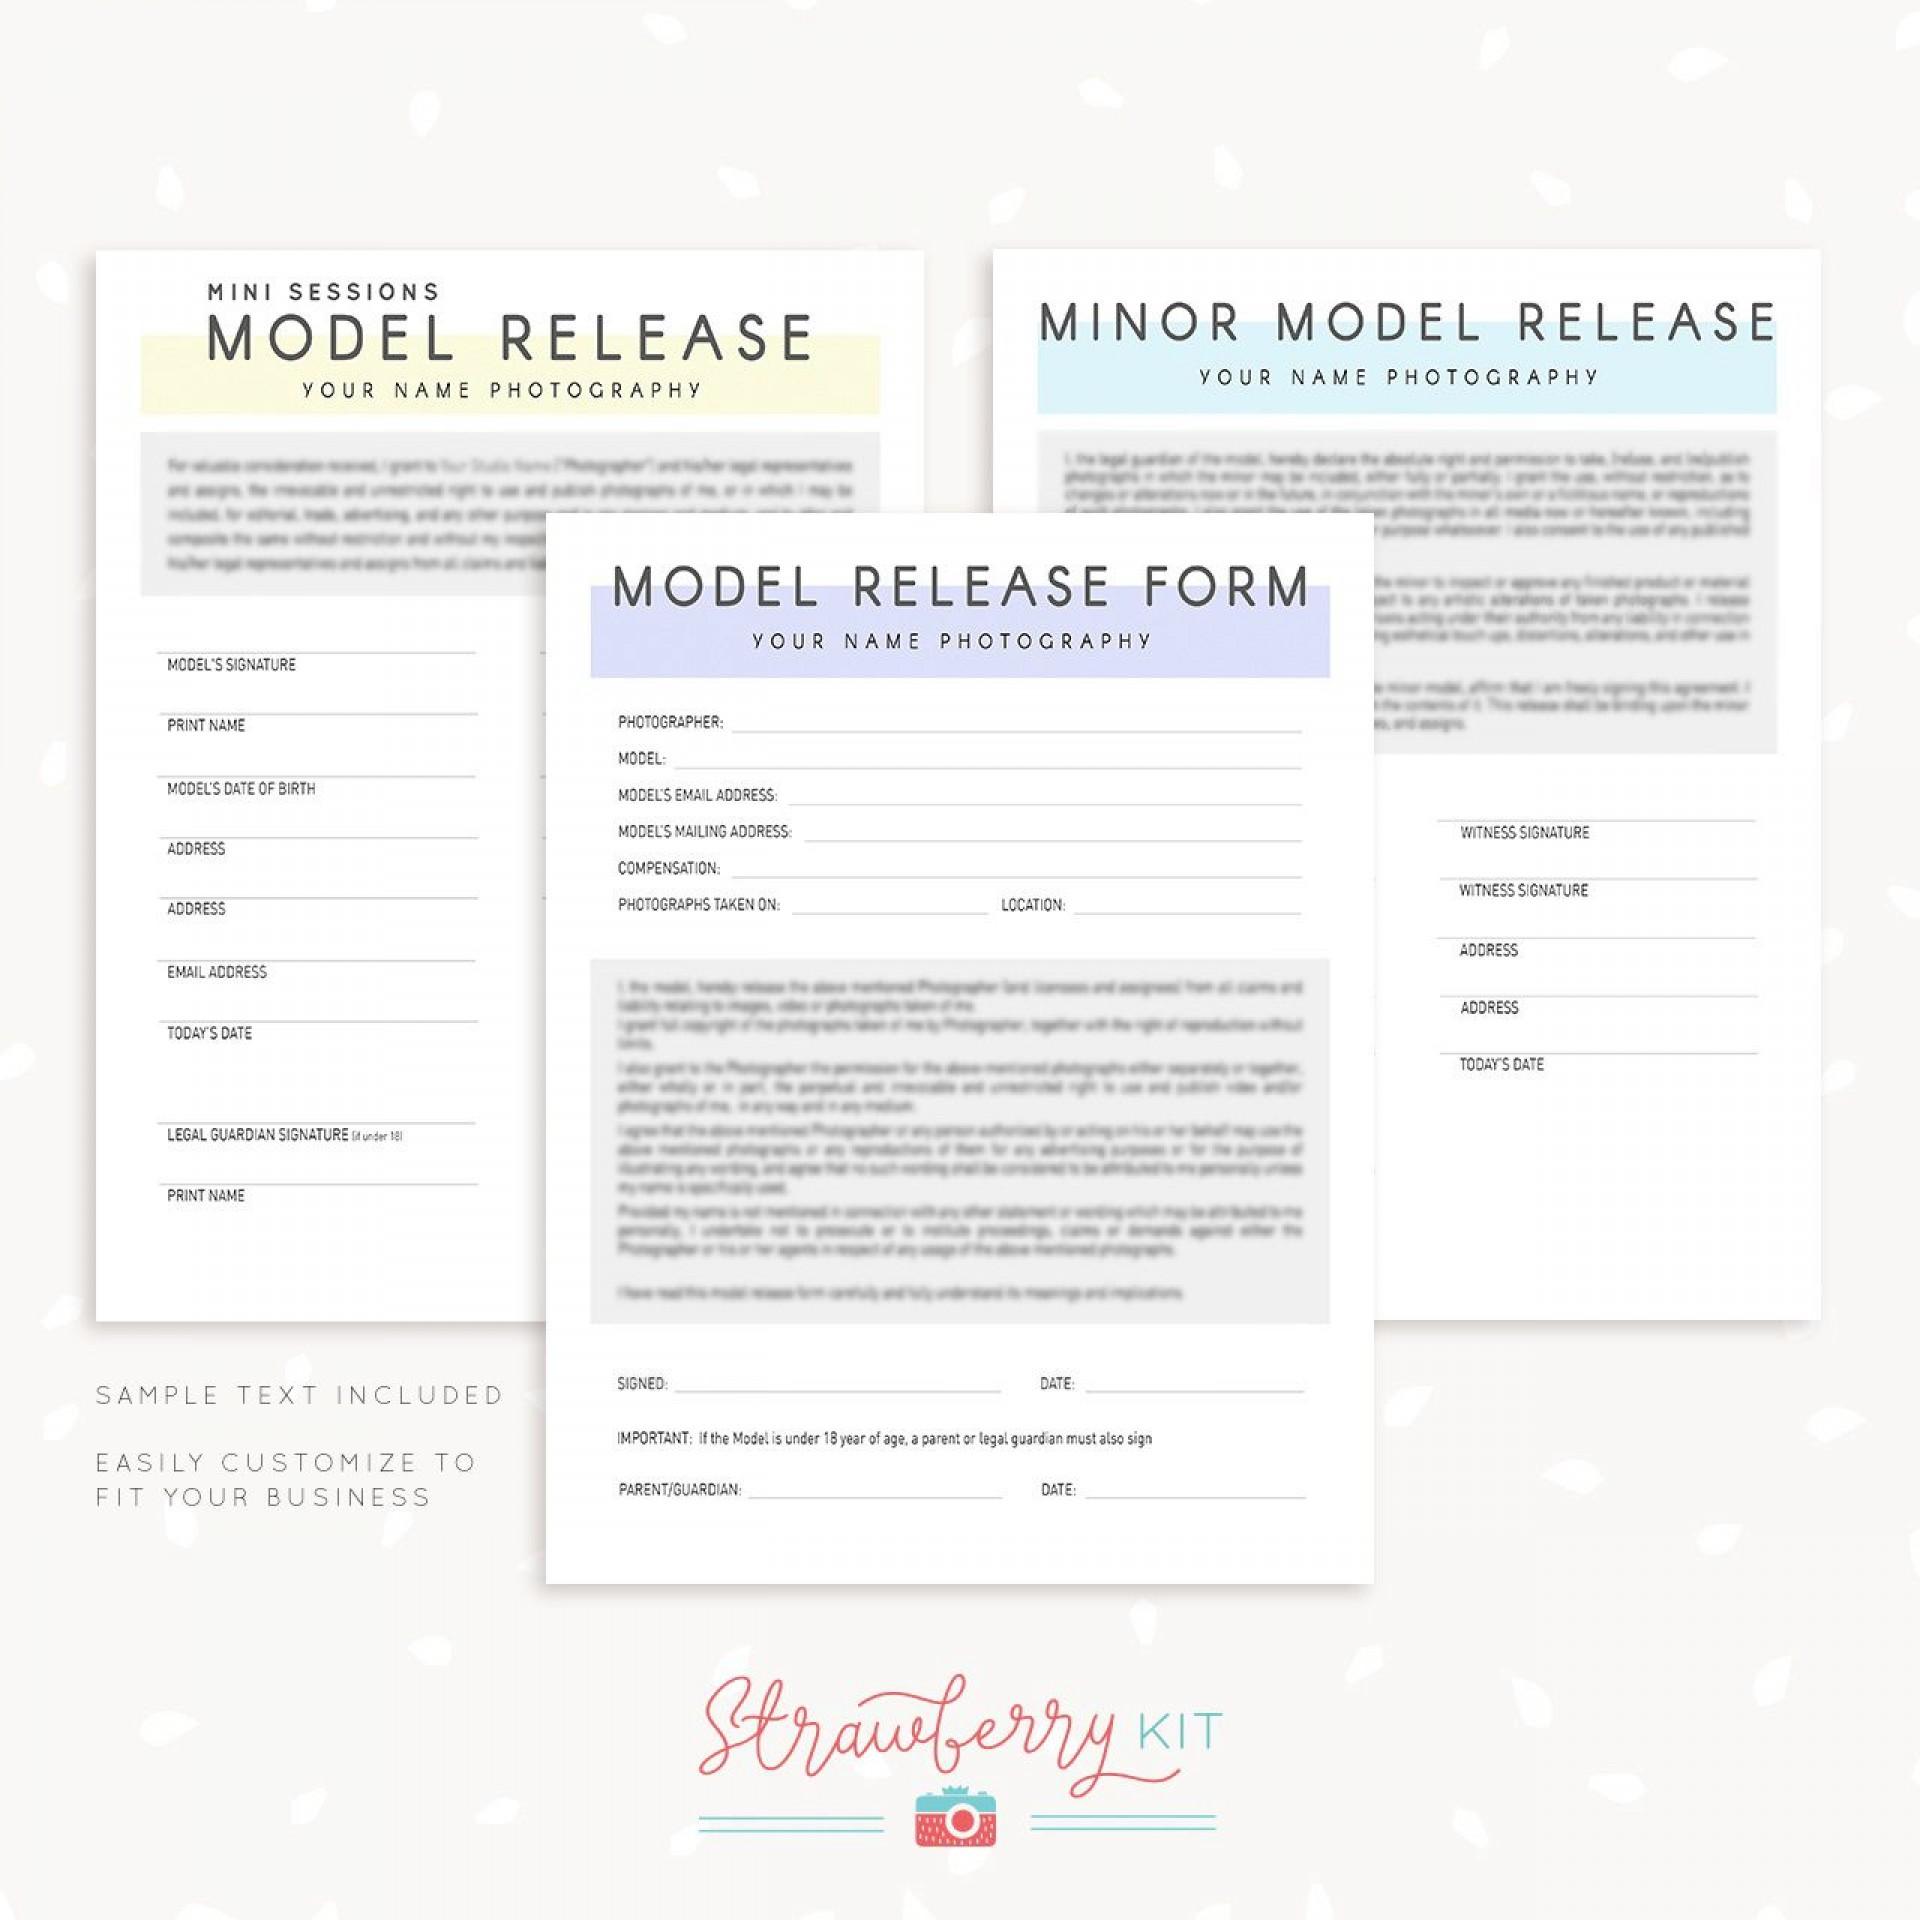 007 Wondrou Model Release Form Template Picture  Photography Uk Gdpr Australia1920